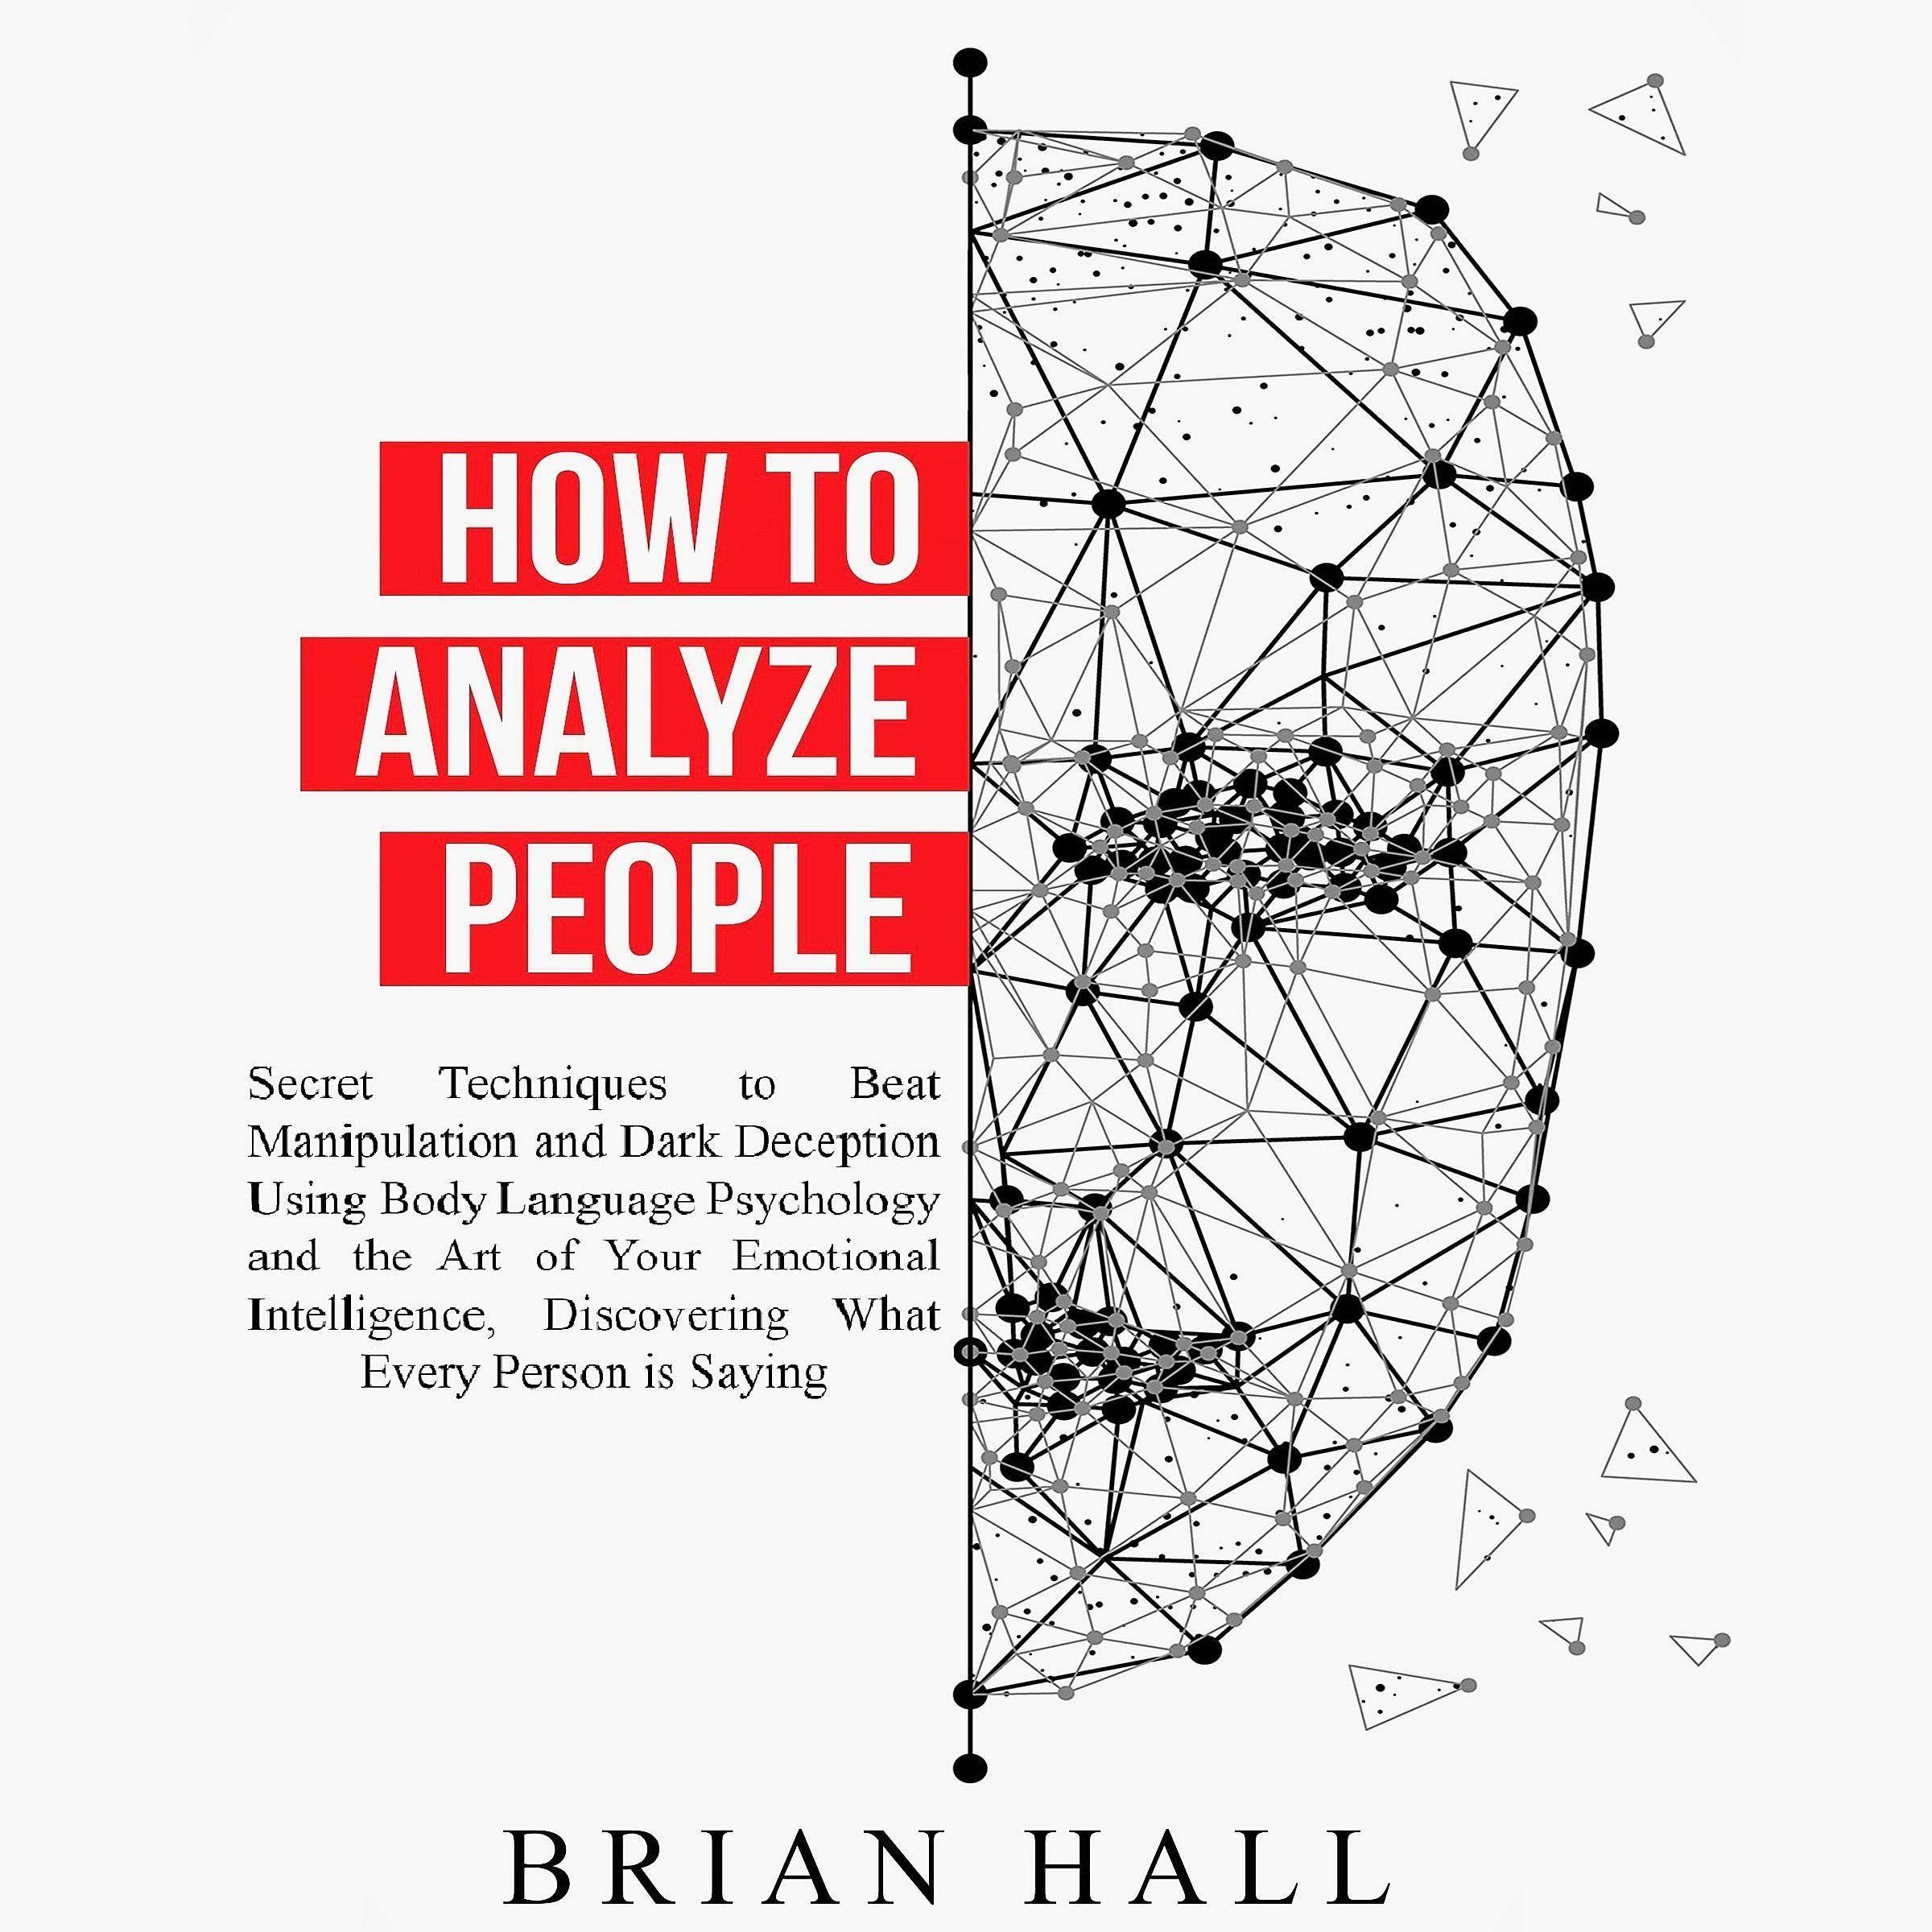 How To Analyze People Secret Techniques To Beat Manipulation And Dark Deception Using Body Language P Emotional Intelligence Body Language Criminal Psychology